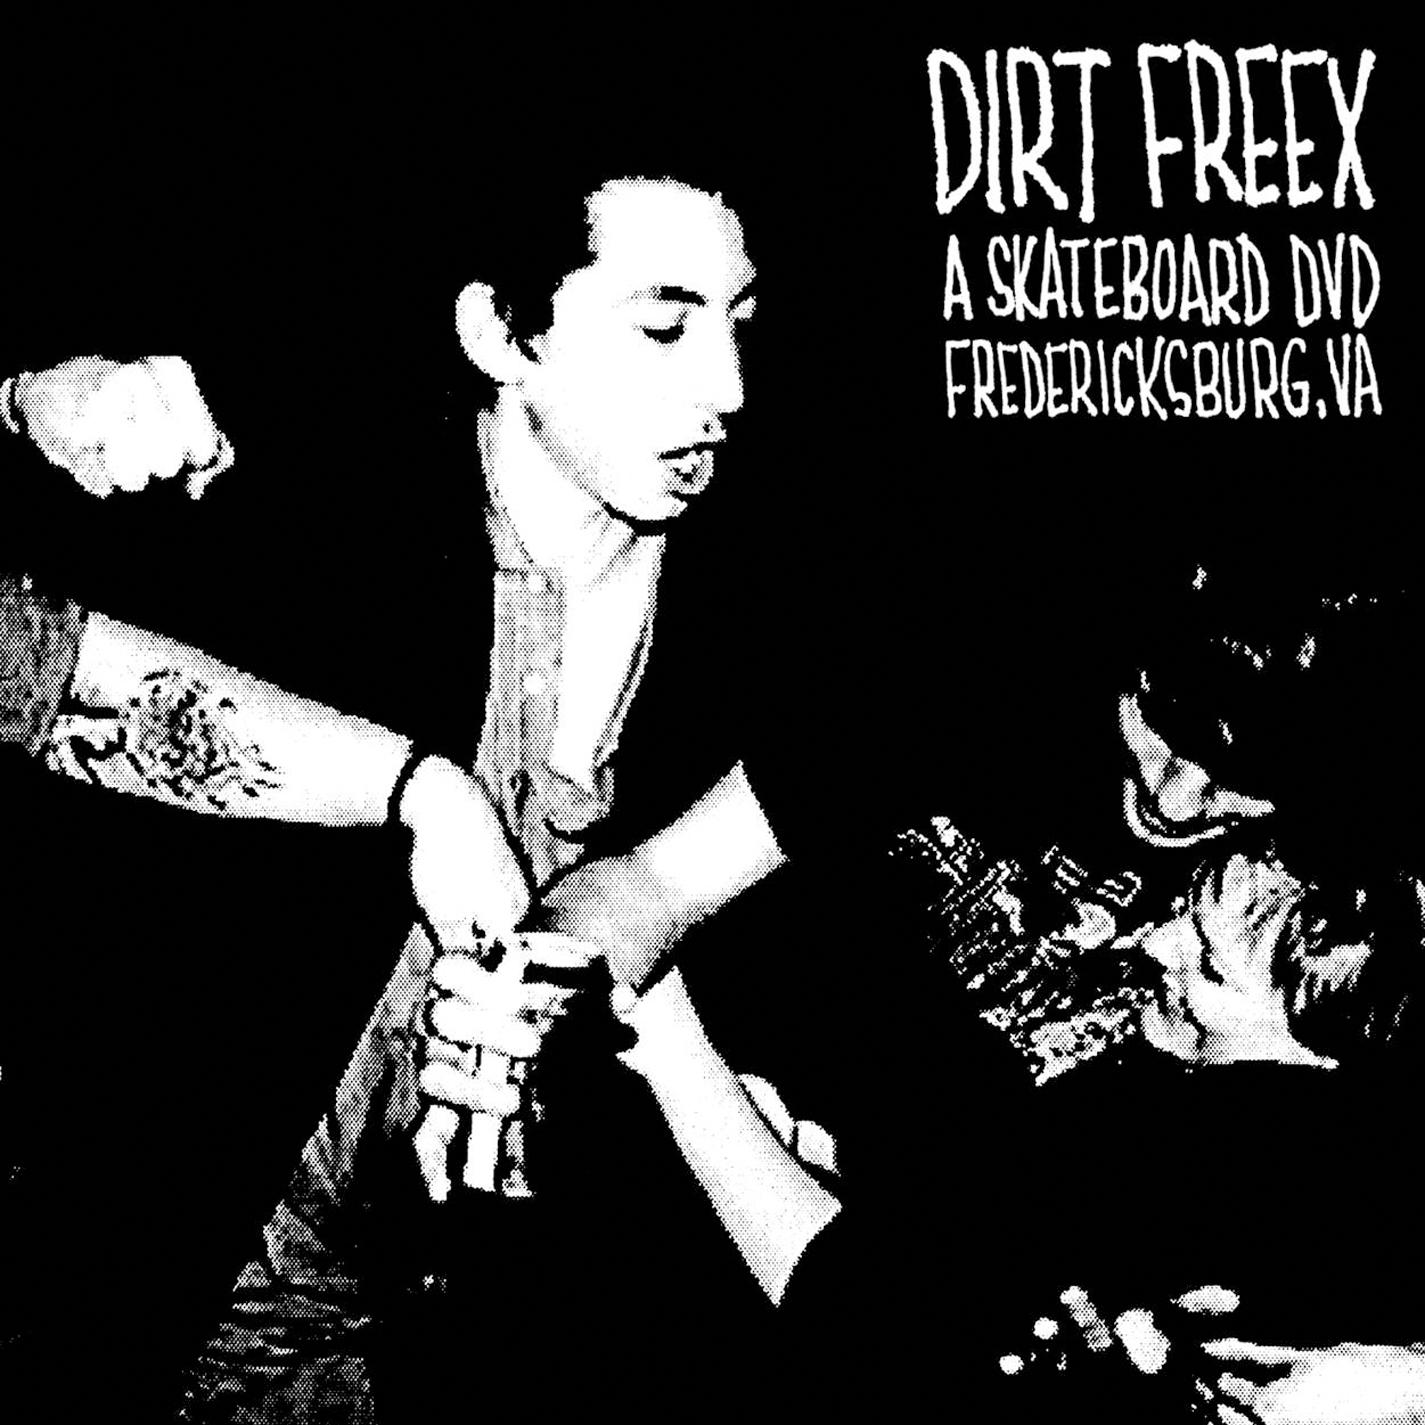 Dirt Freex